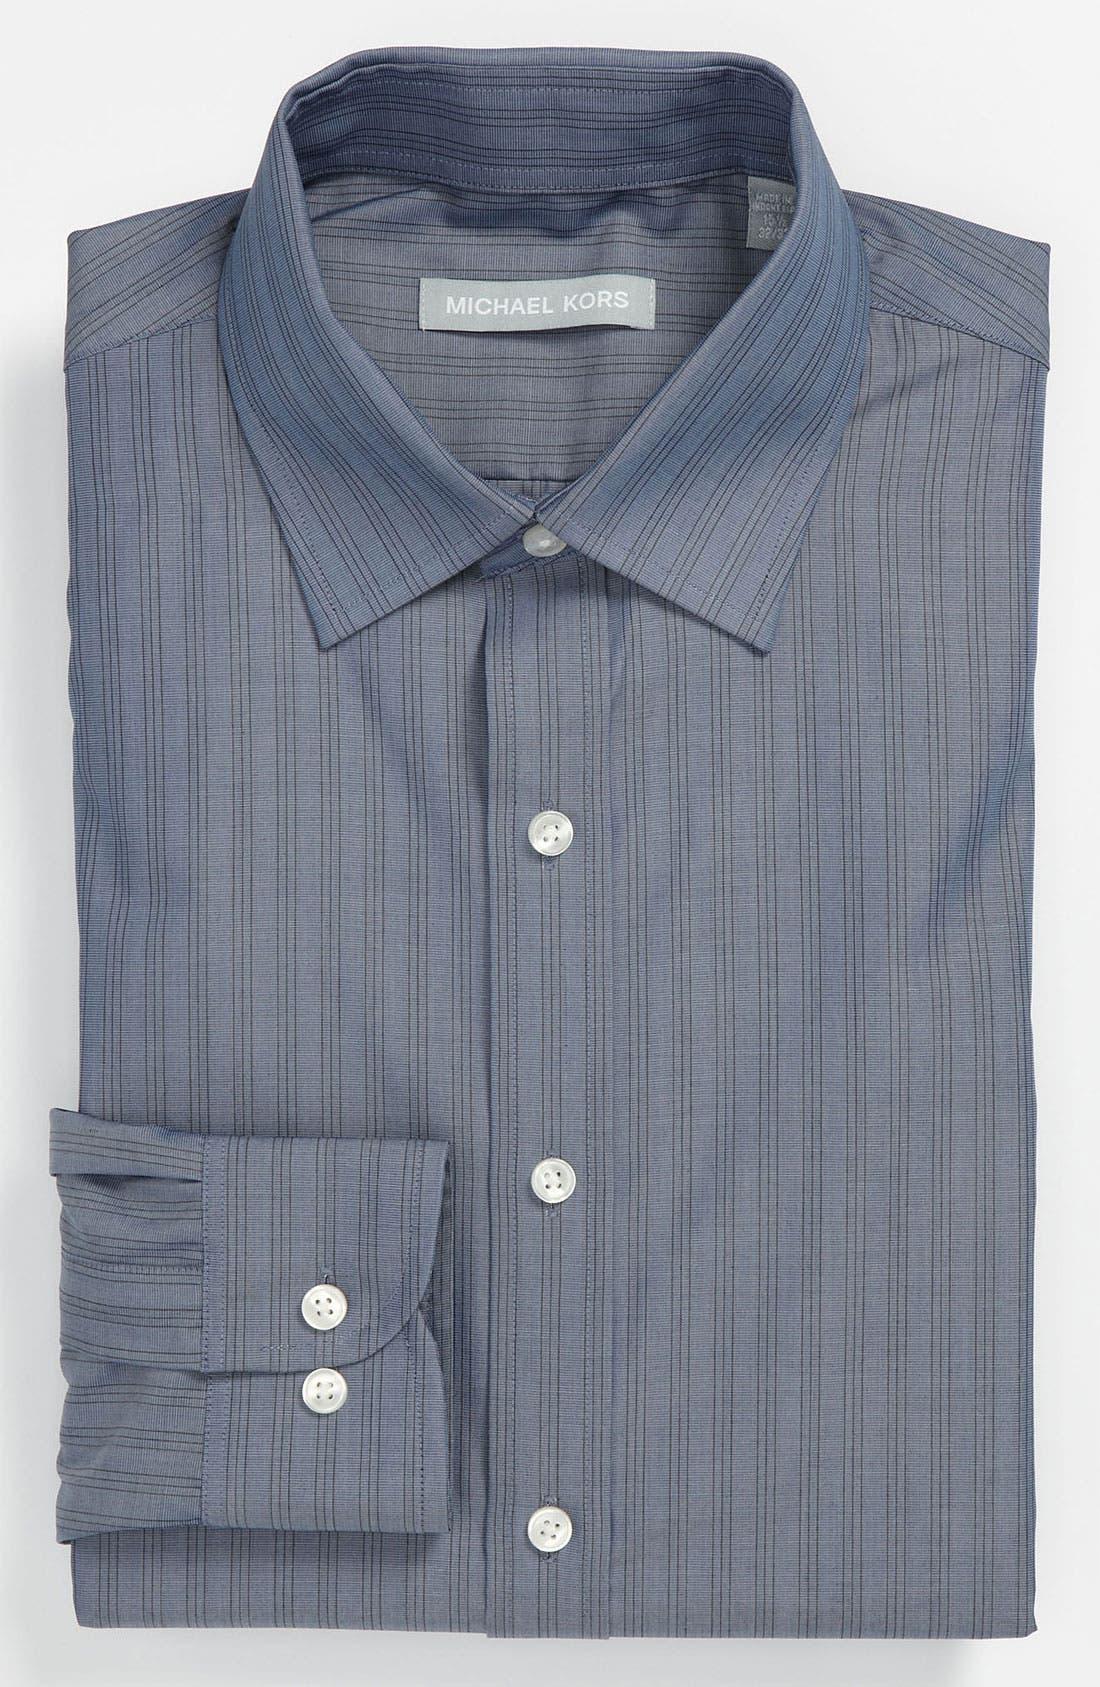 Alternate Image 1 Selected - Michael Kors Regular Fit Non-Iron Dress Shirt